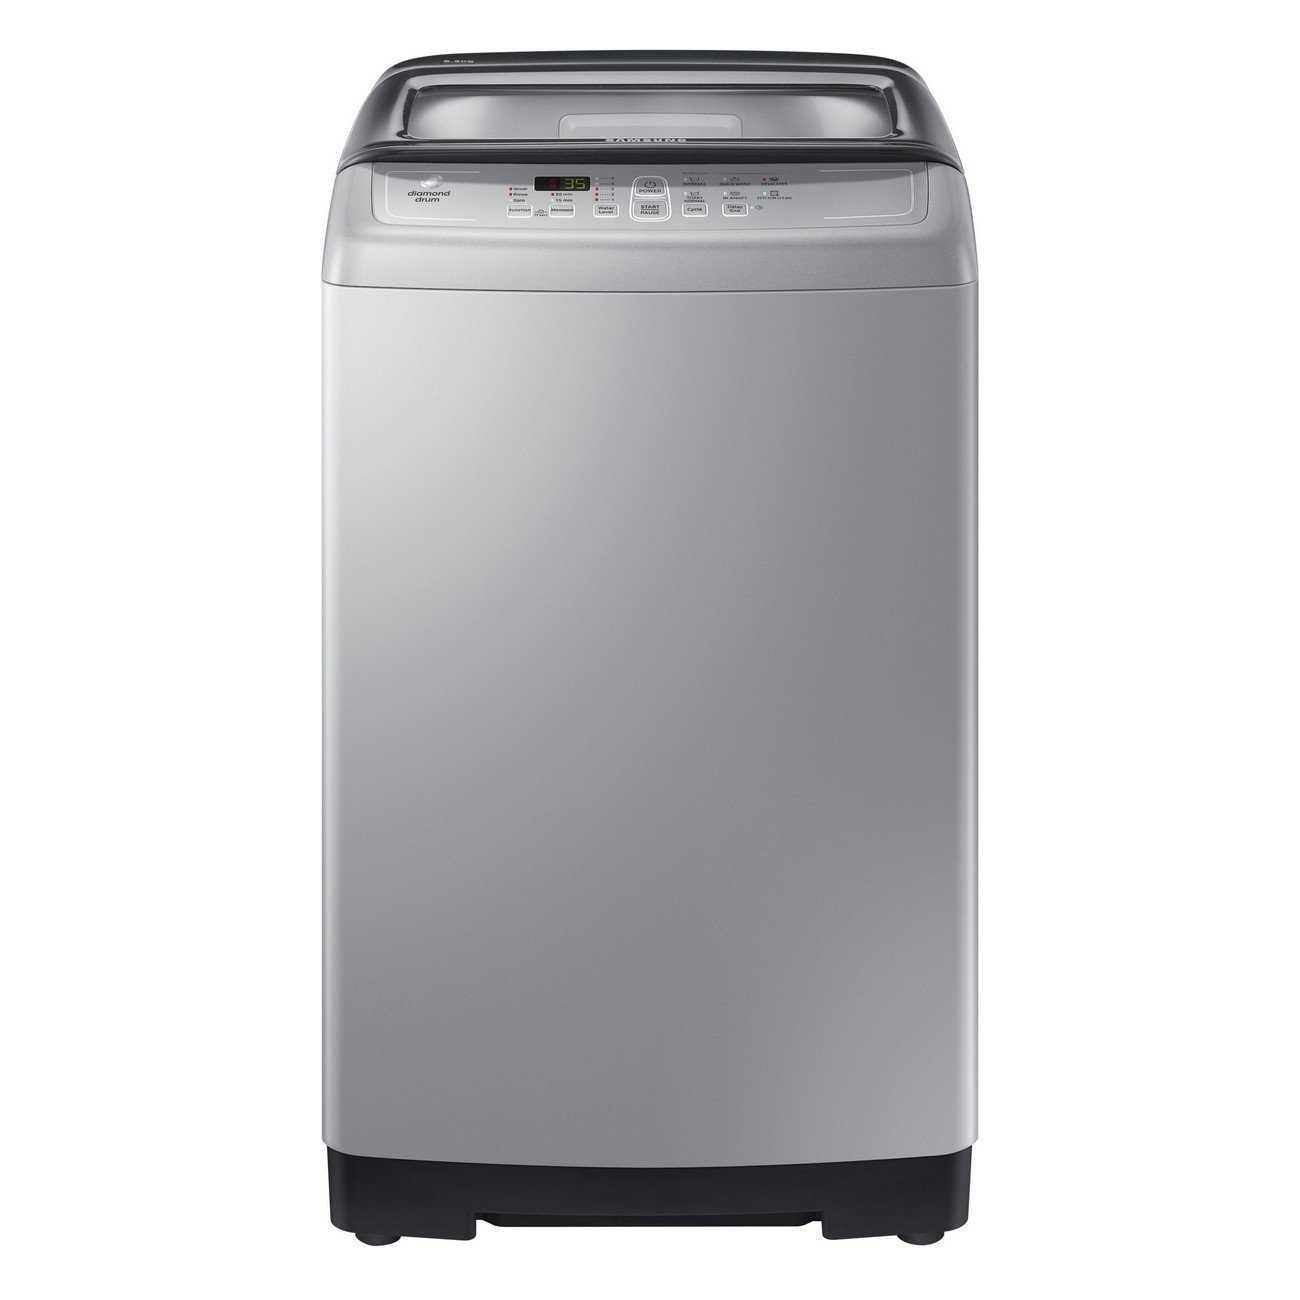 Samsung WA62M4100HV 6.2 Kg Fully Automatic Top Loading Washing Machine